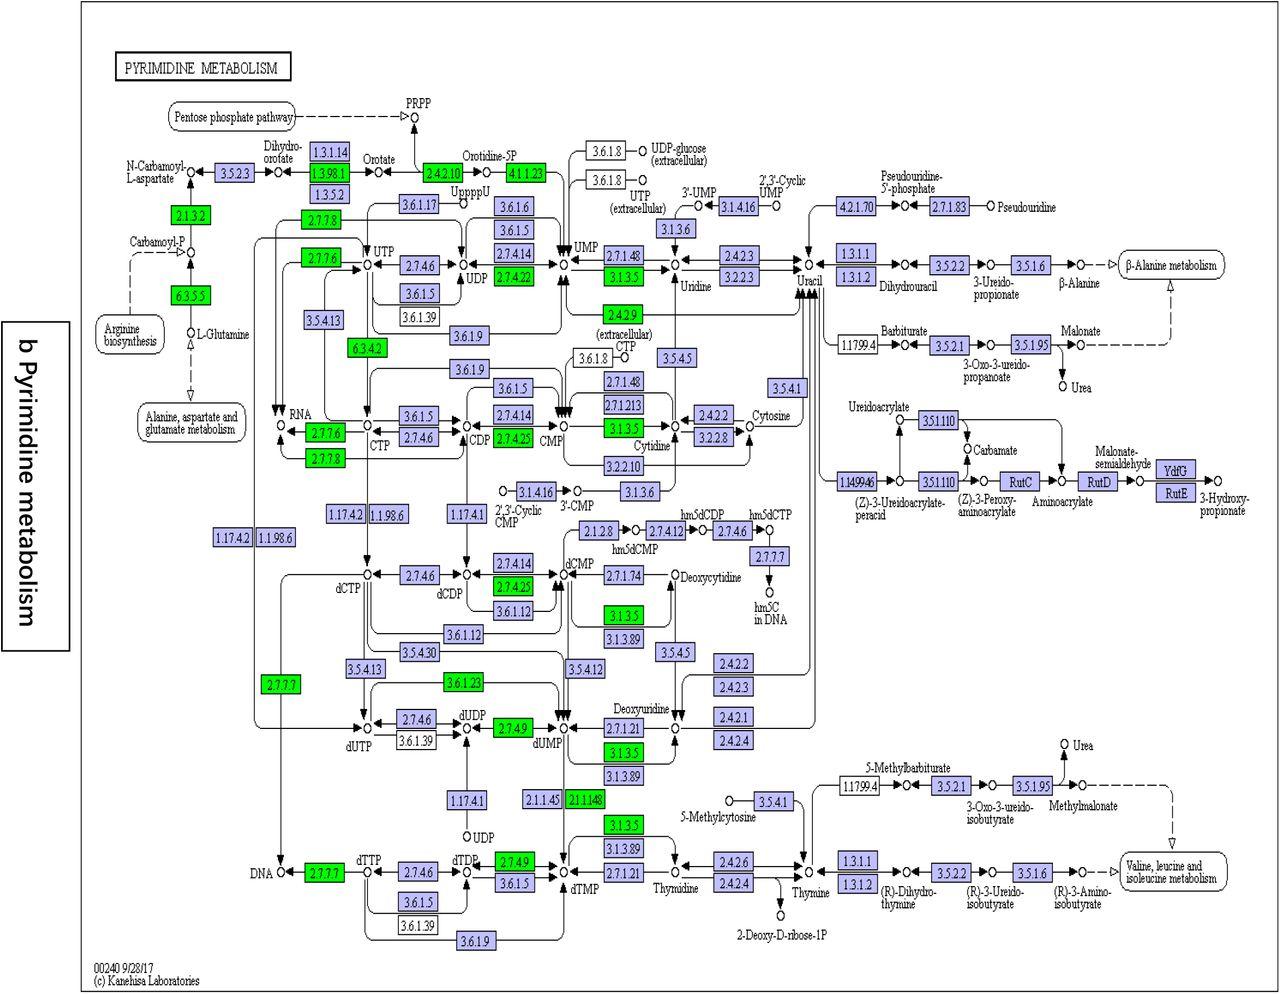 Baja Warrior Vs Coleman on tao tao clutch diagram, chinese atv engine diagram, baja engine diagram, tao tao atv parts diagram, baja suspension, 2007 yamaha baja scooter carb diagram,